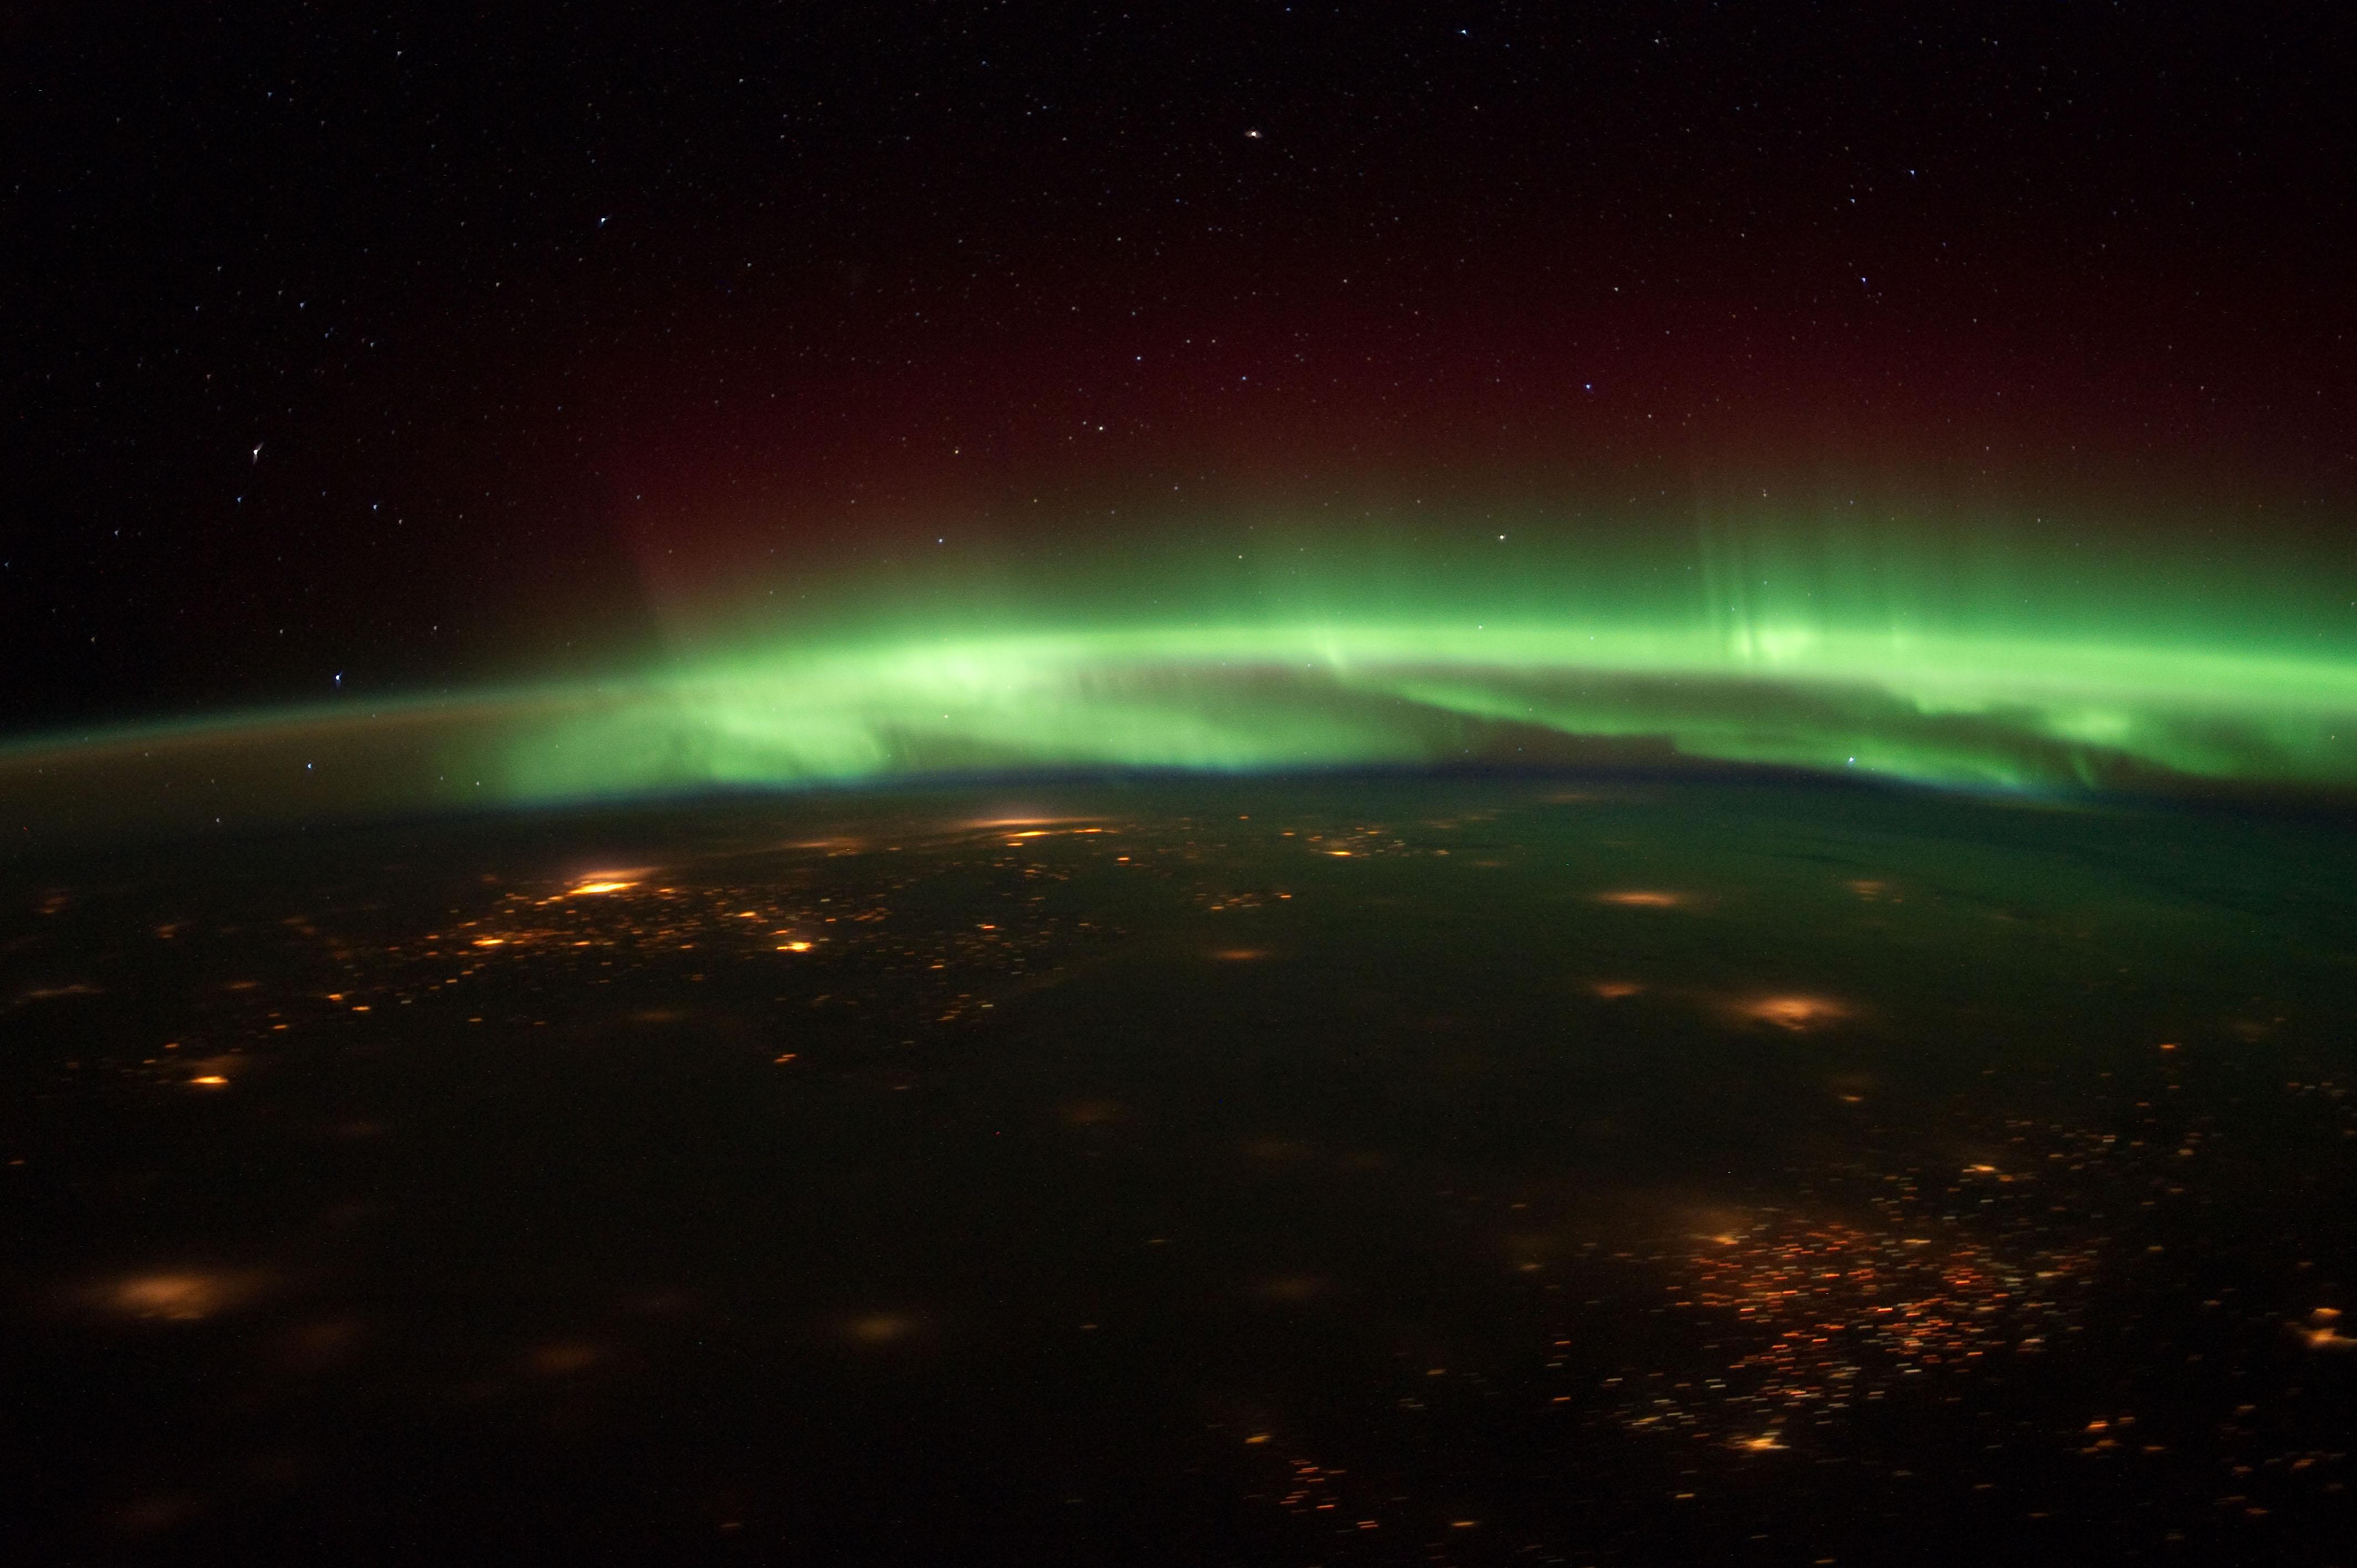 5- Polar auroras